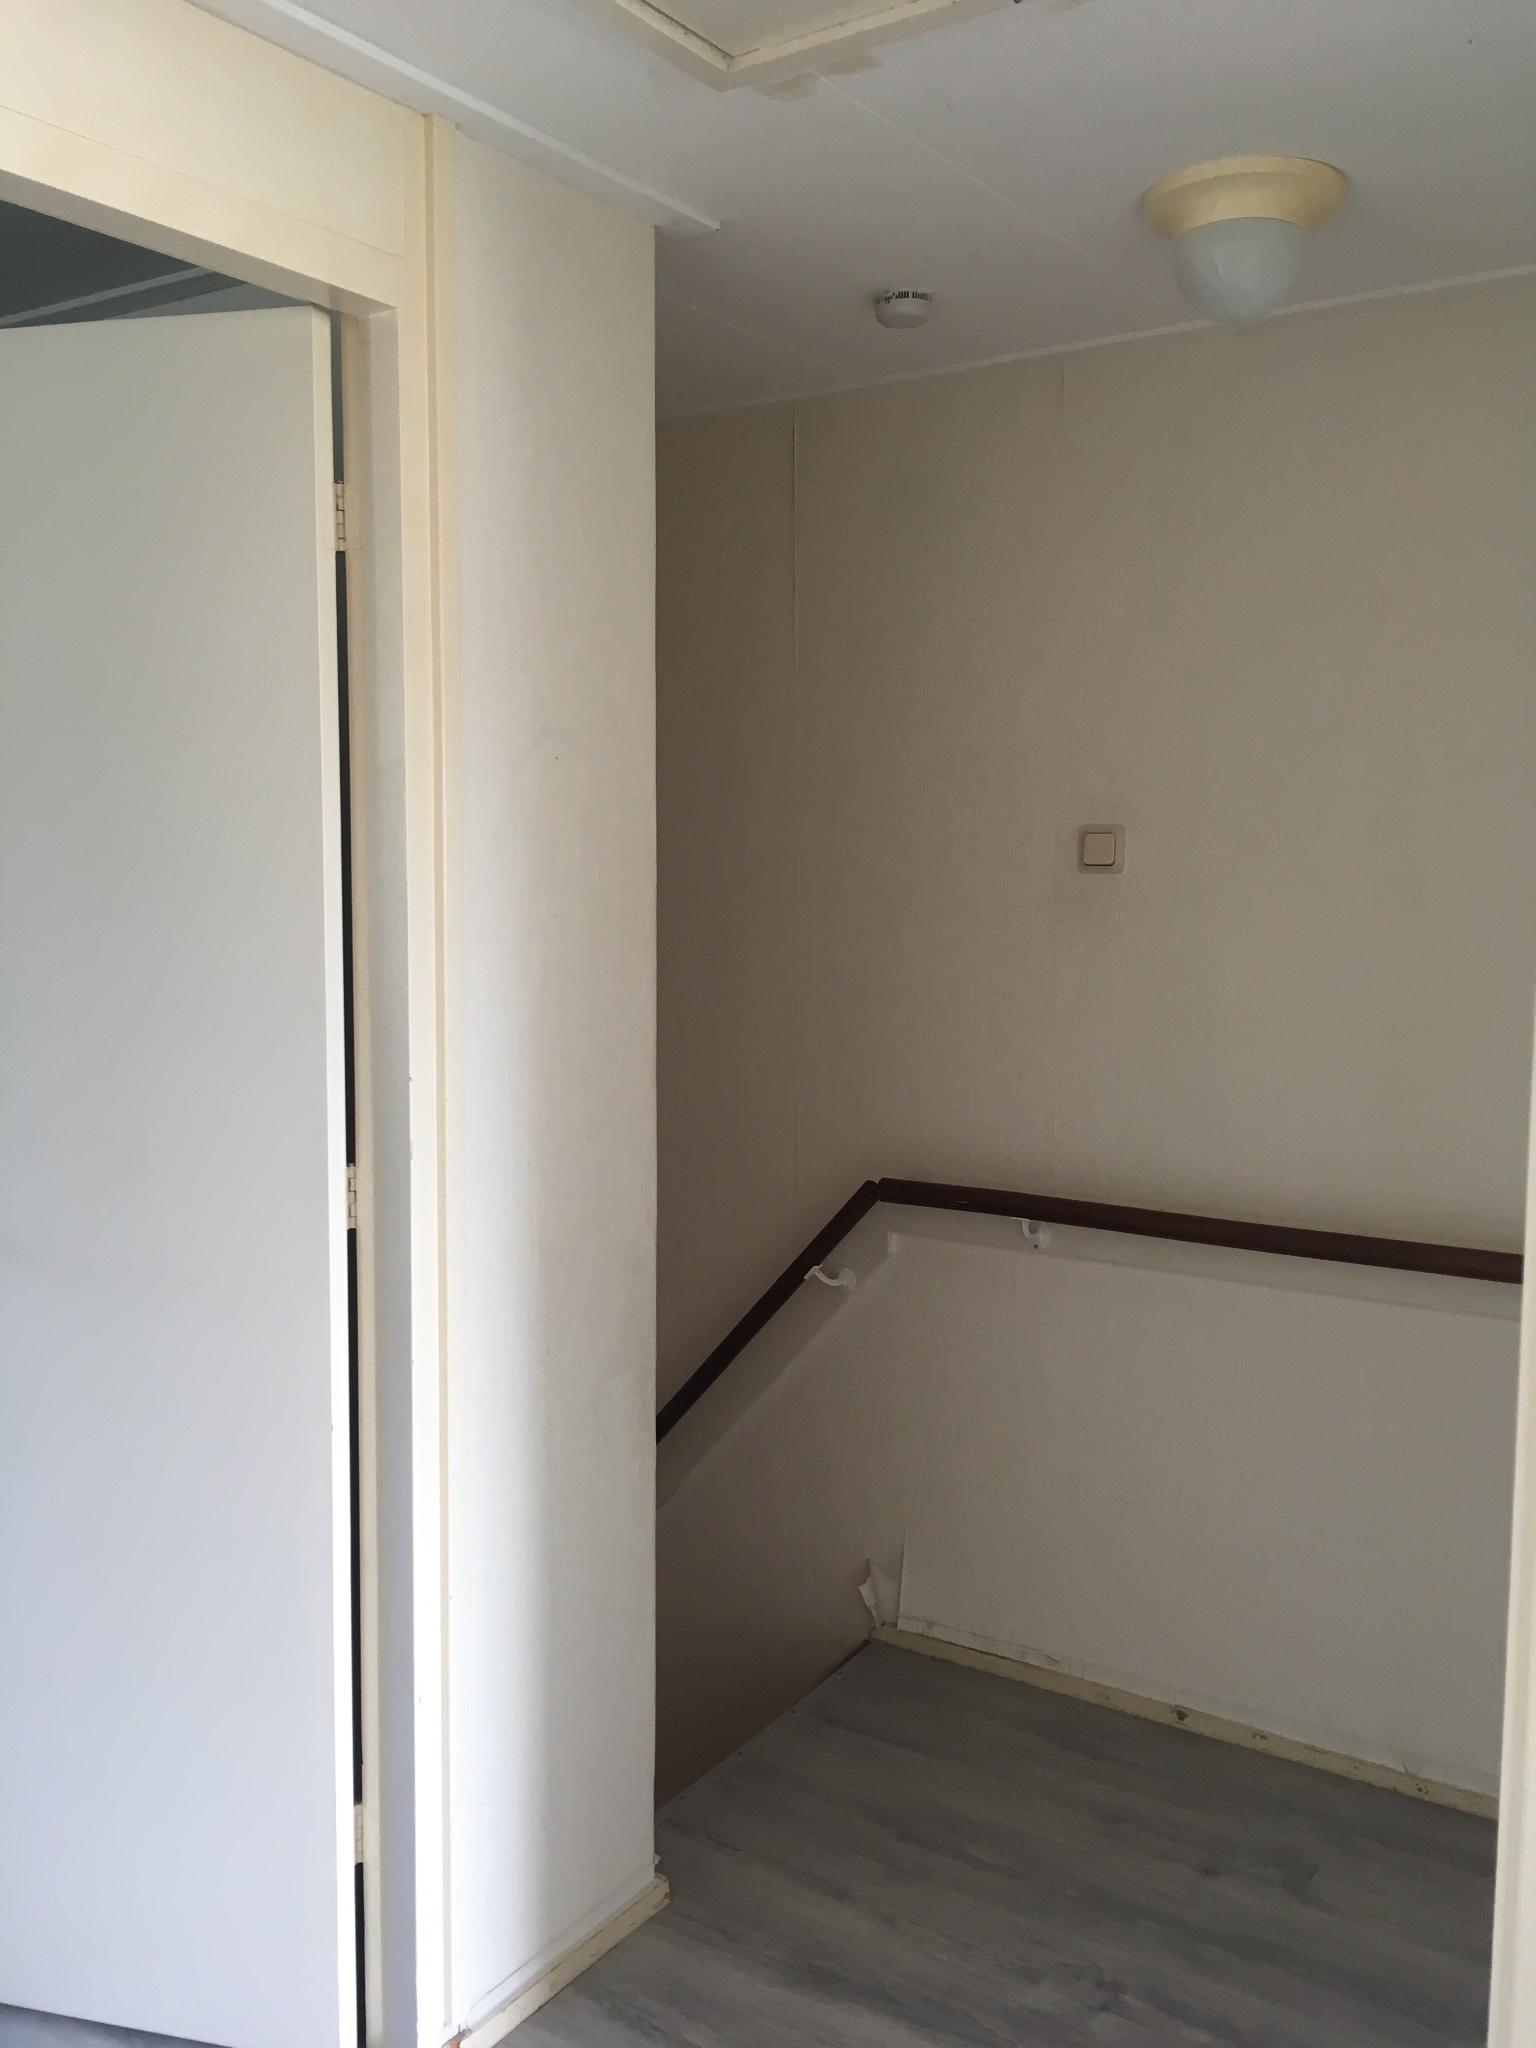 Vaste zoldertrap maken en gat vlizotrap trap dicht maken for Vlizotrap inbouwen